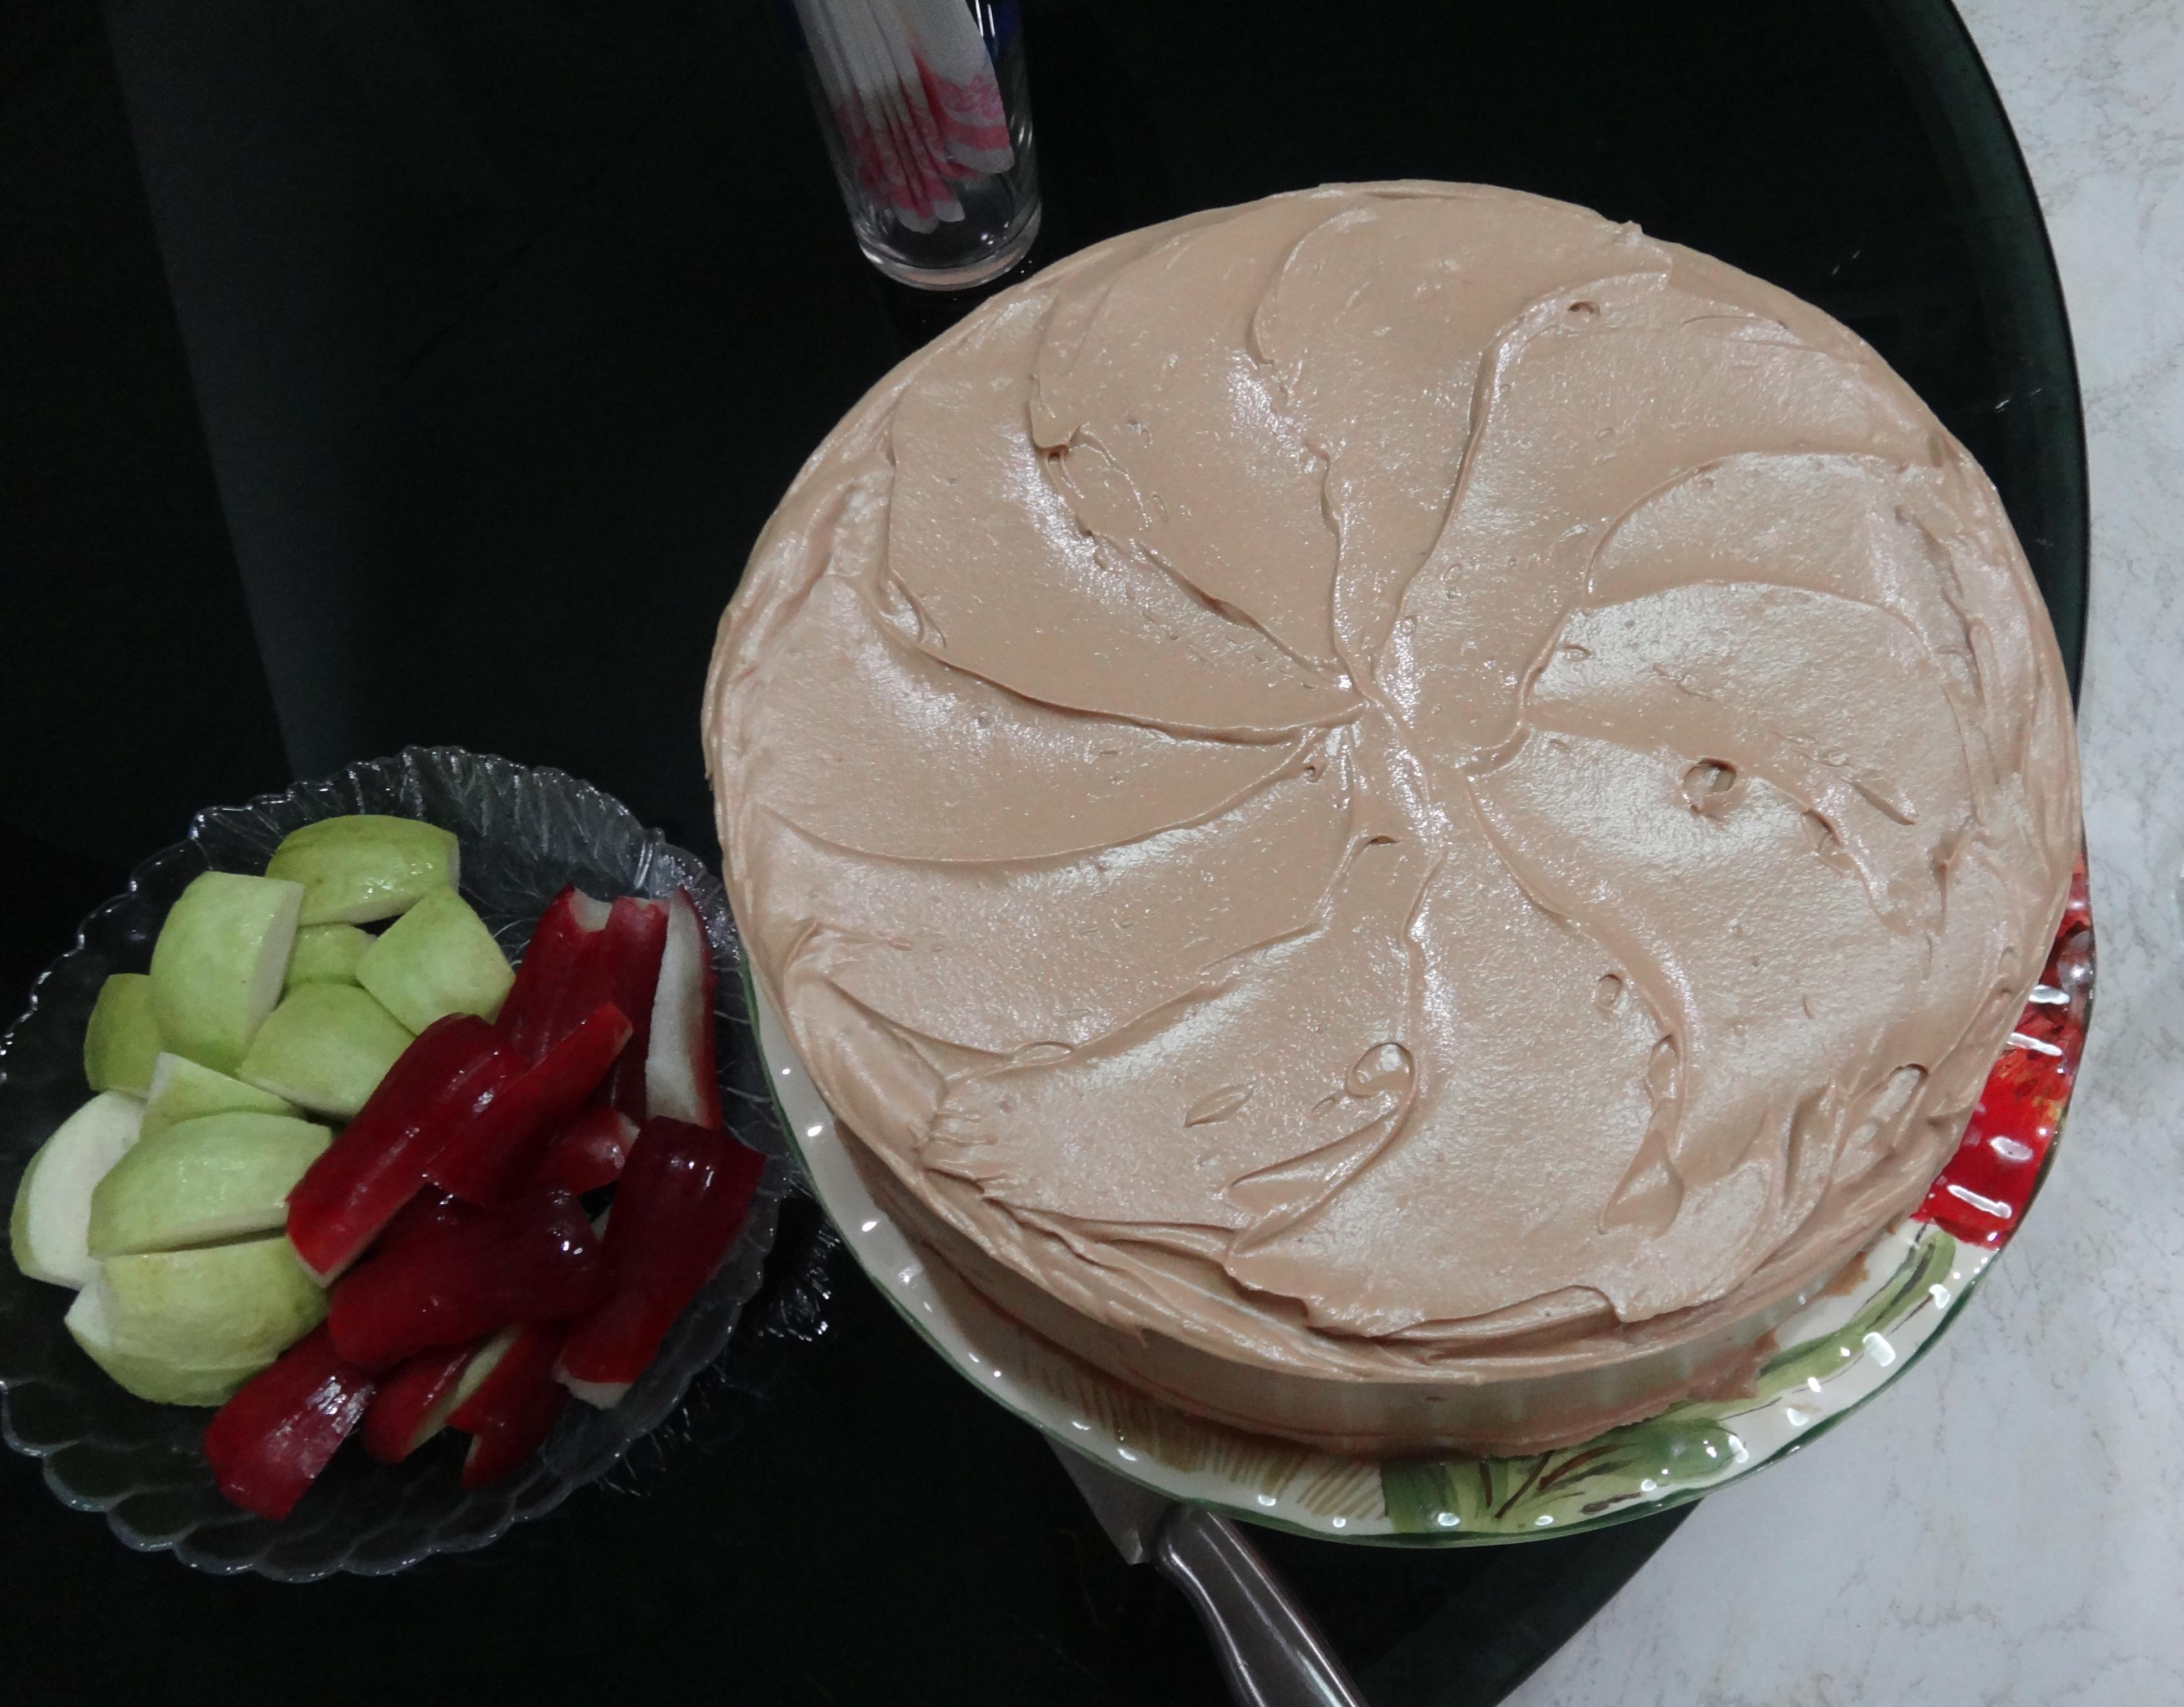 Beatty S Chocolate Cake With Chocolate Buttercream